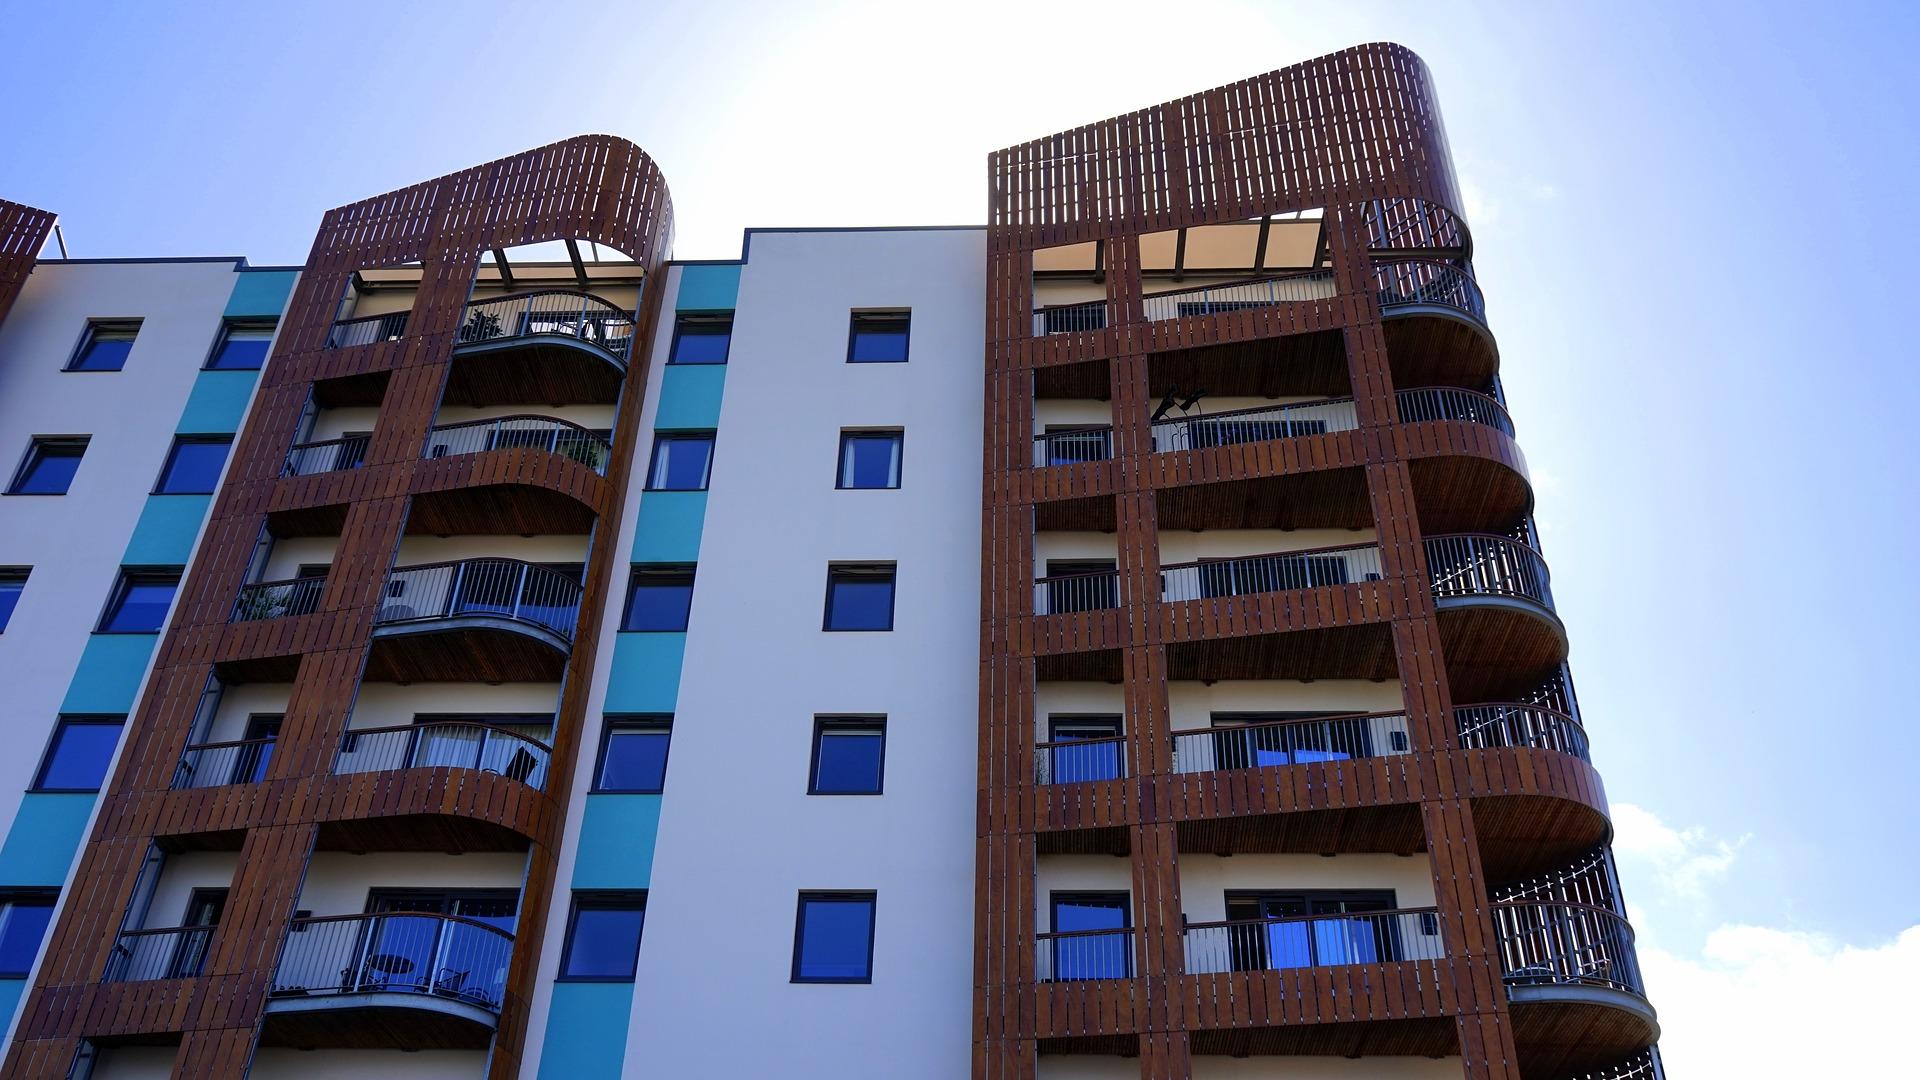 Immobilienbewertung Aschaffenburg - Sachverständiger Immobilienbewertung